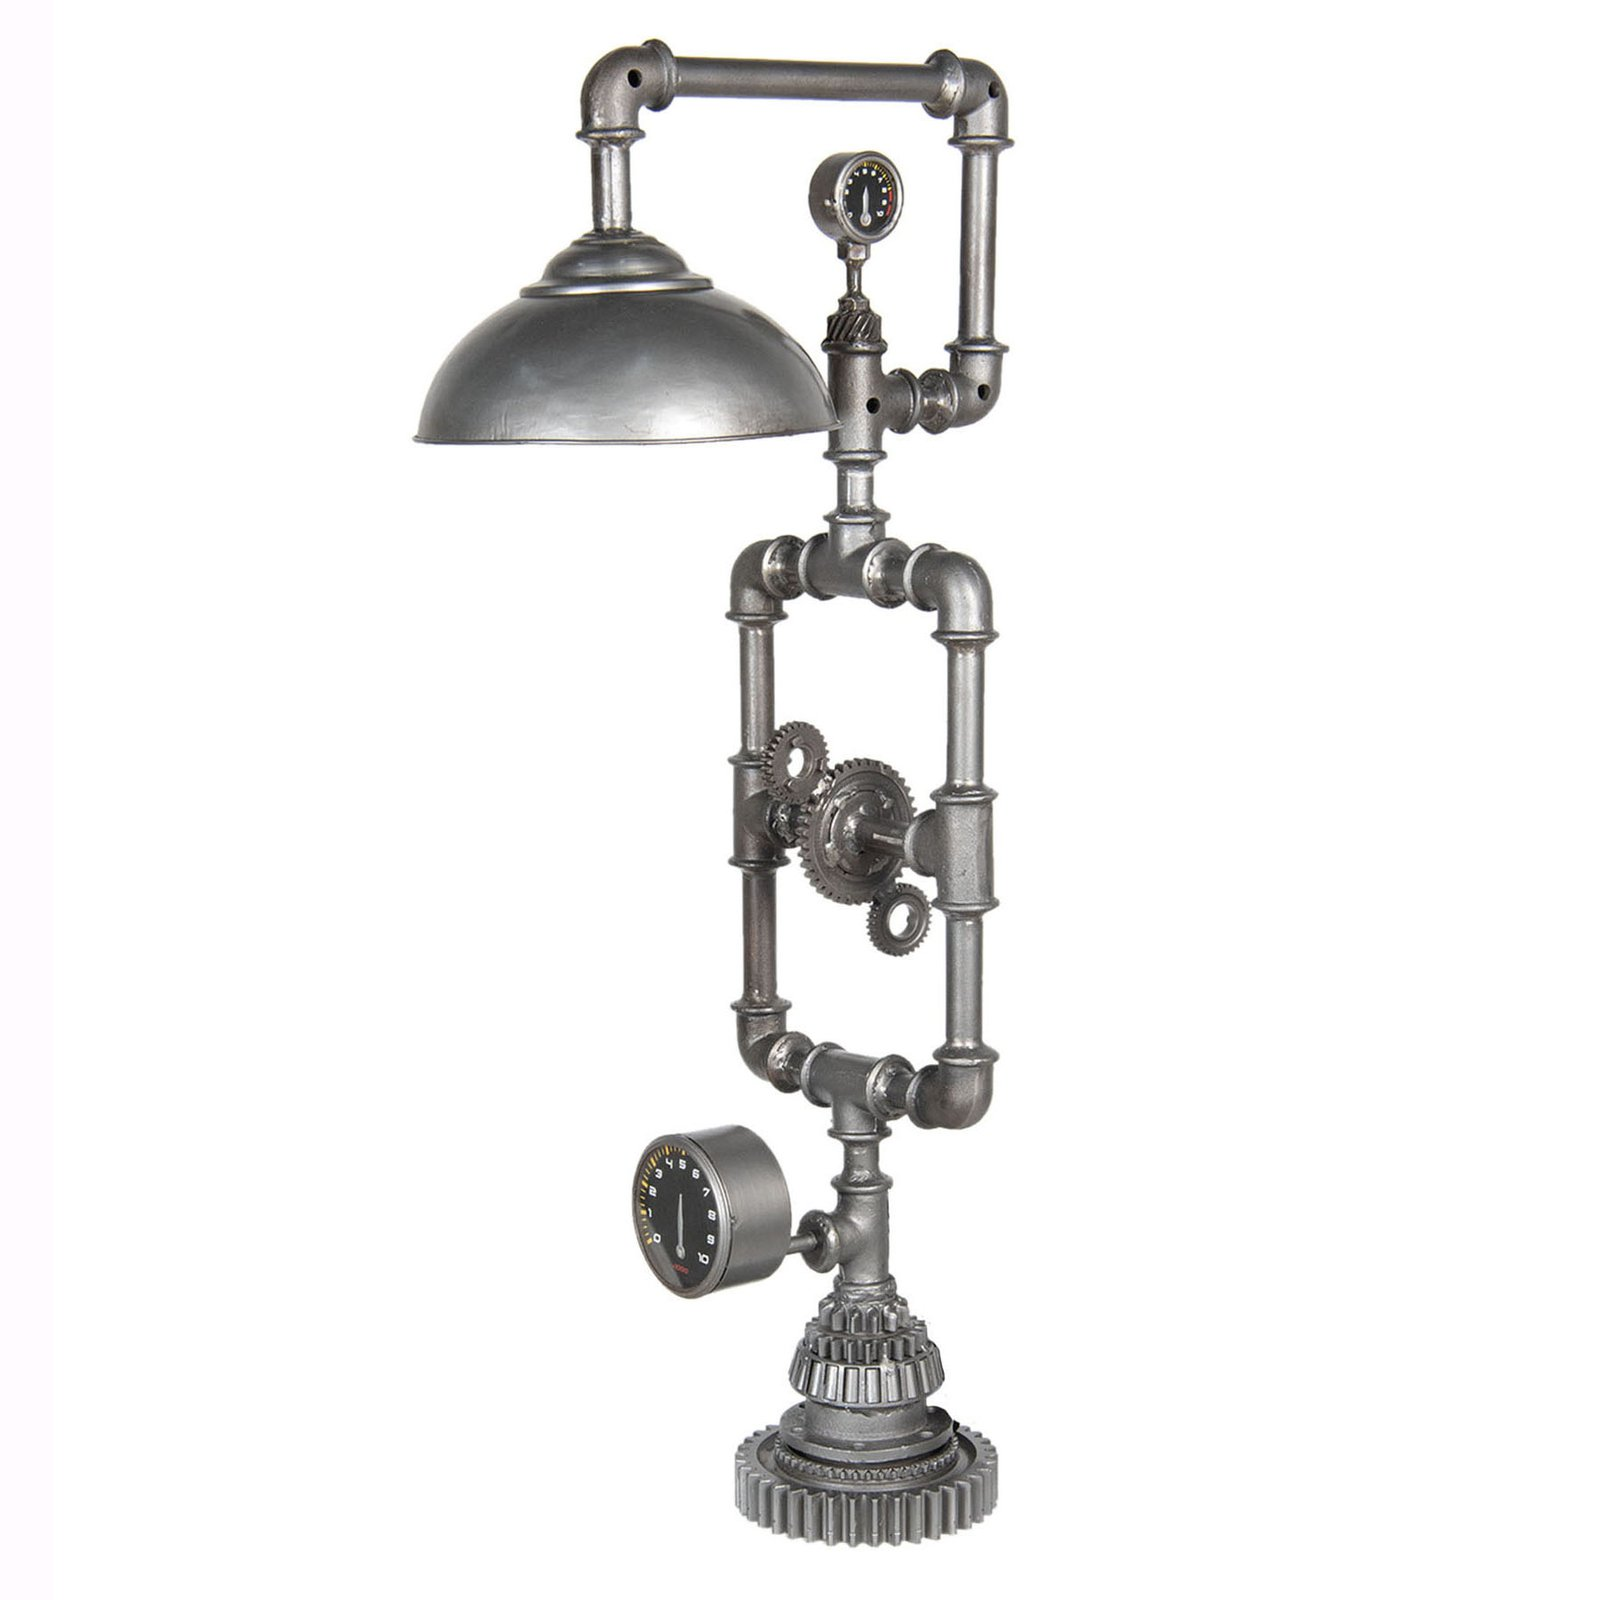 271 gulvlampe i industridesign